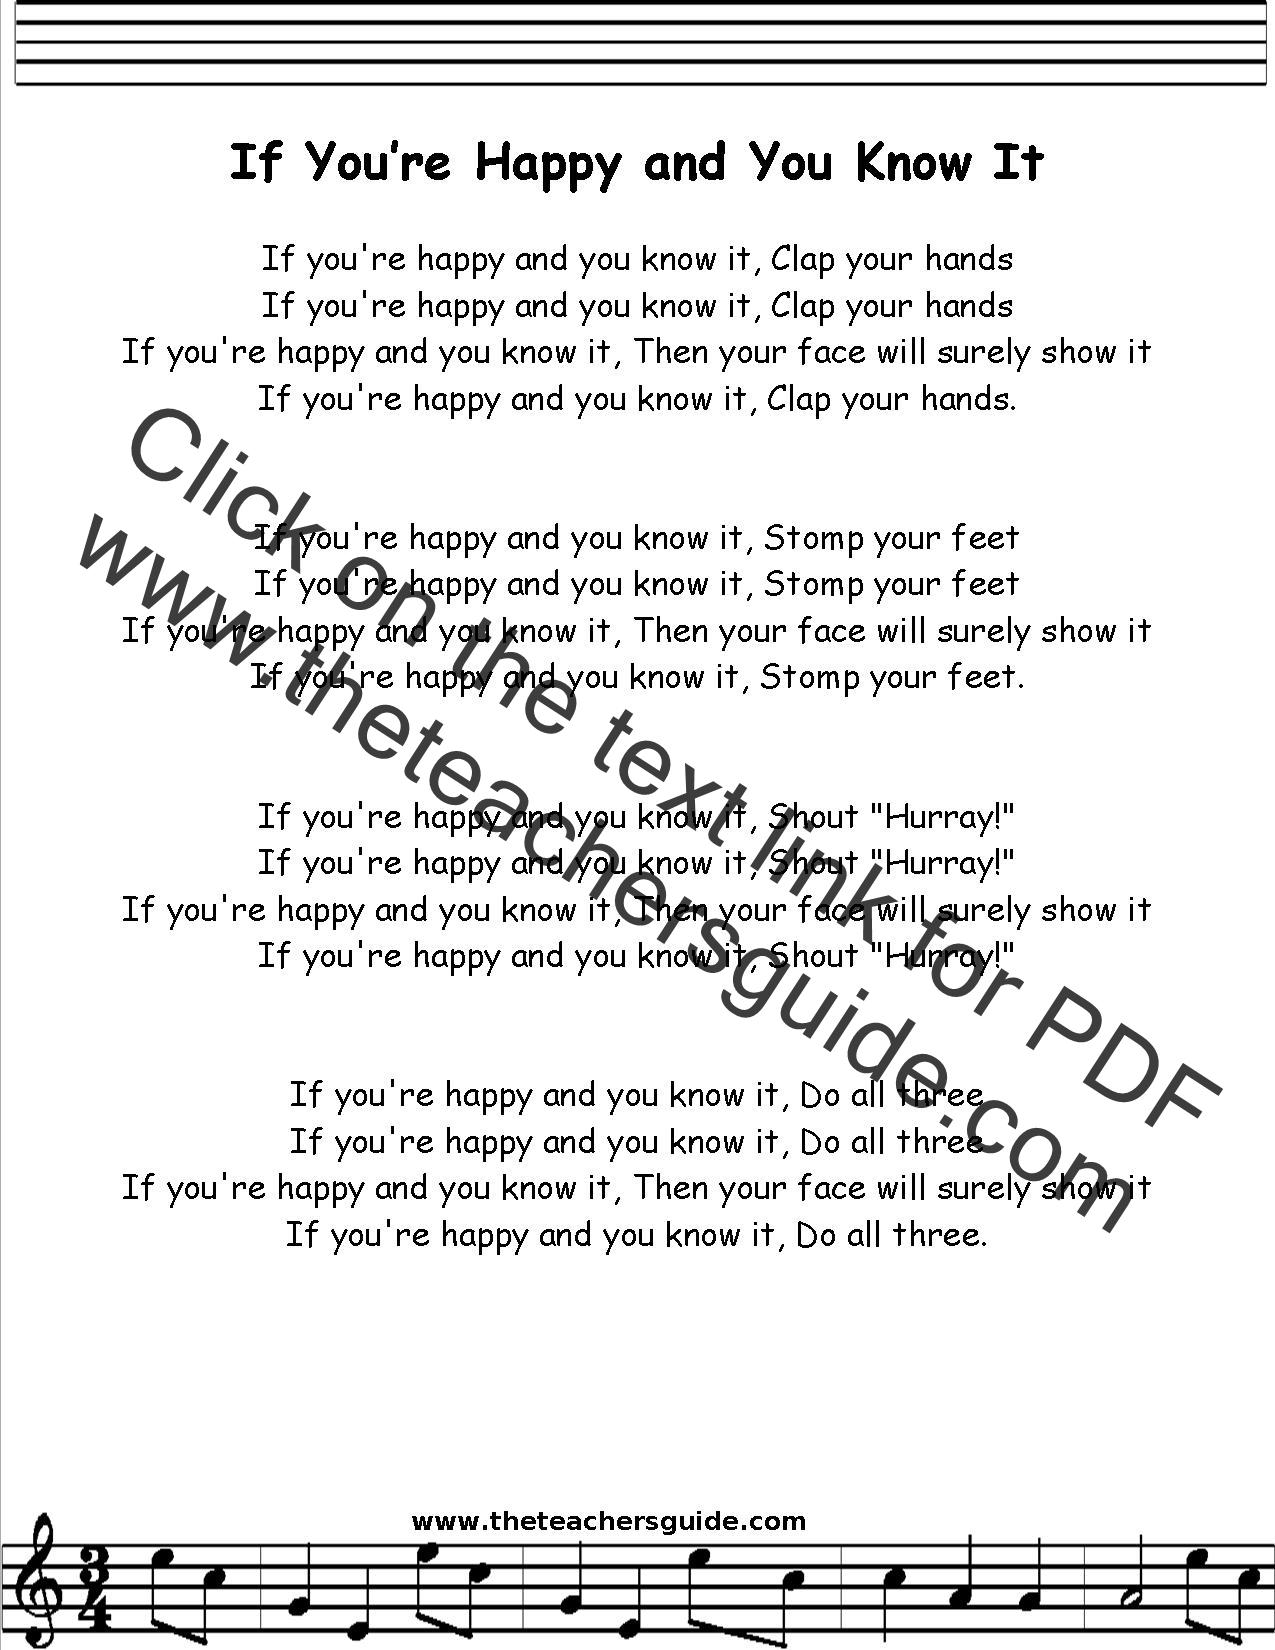 If You Re Happy And You Know It Lyrics Printout Midi